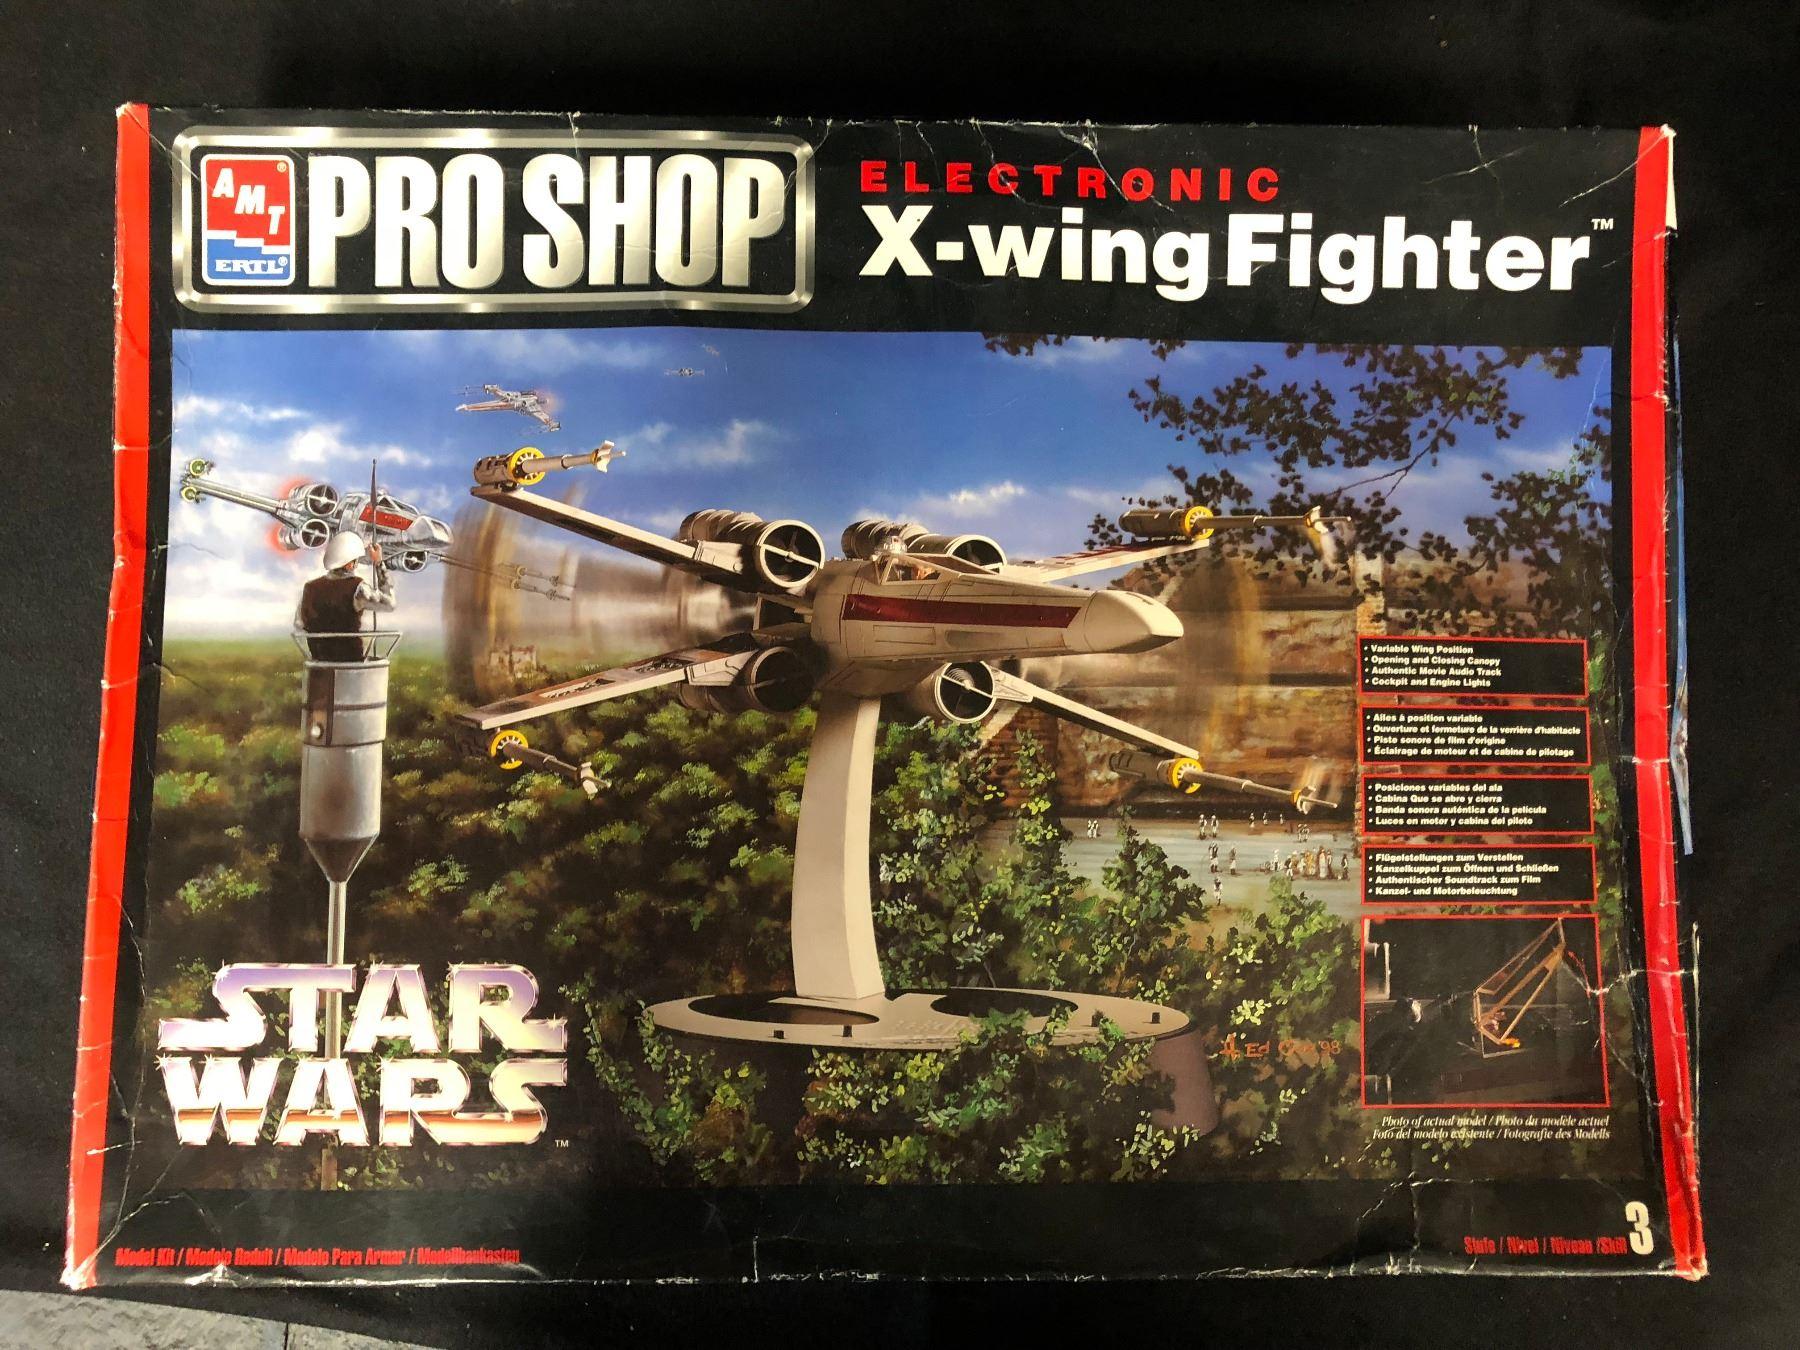 AMT/ERTL PRO SHOP STAR WARS ELECTRONIC X-WING FIGHTER MODEL KIT  (UNASSEMBLED)